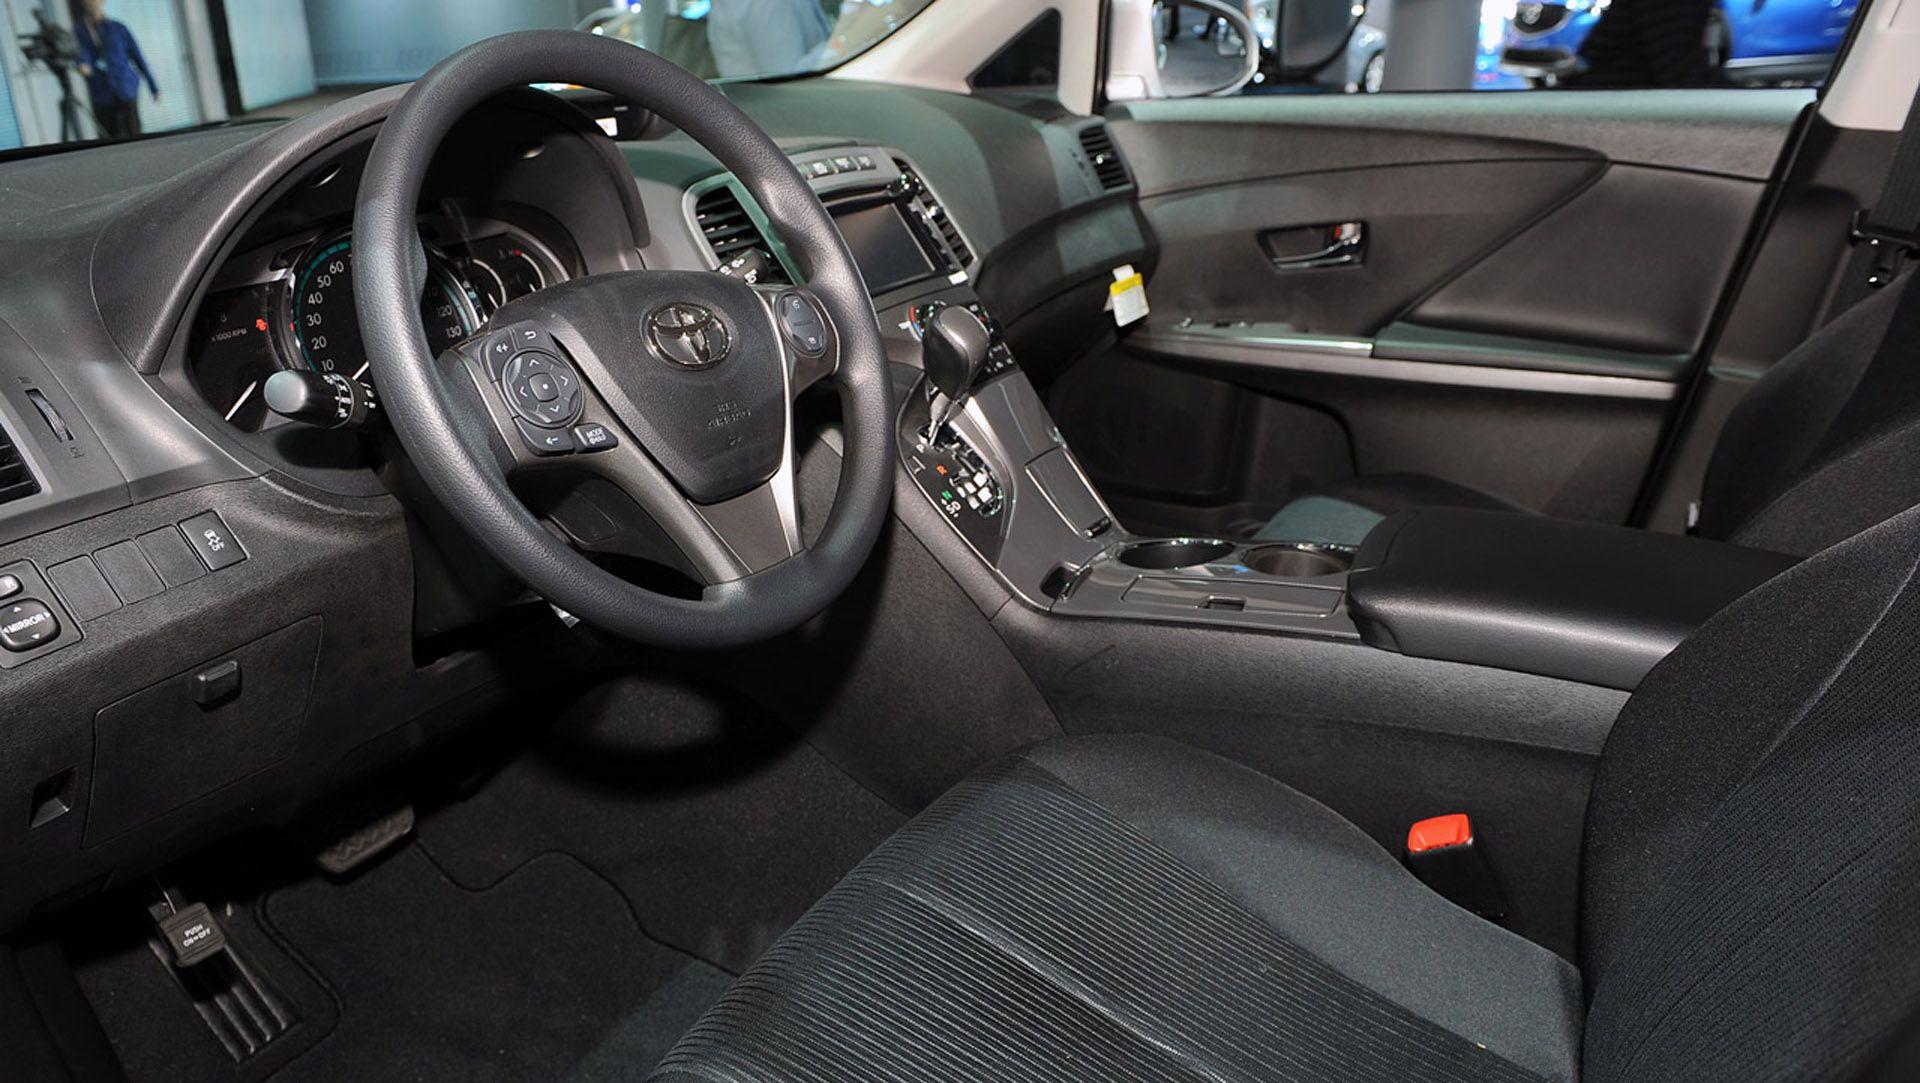 2013 Toyota Venza Venza Pinterest